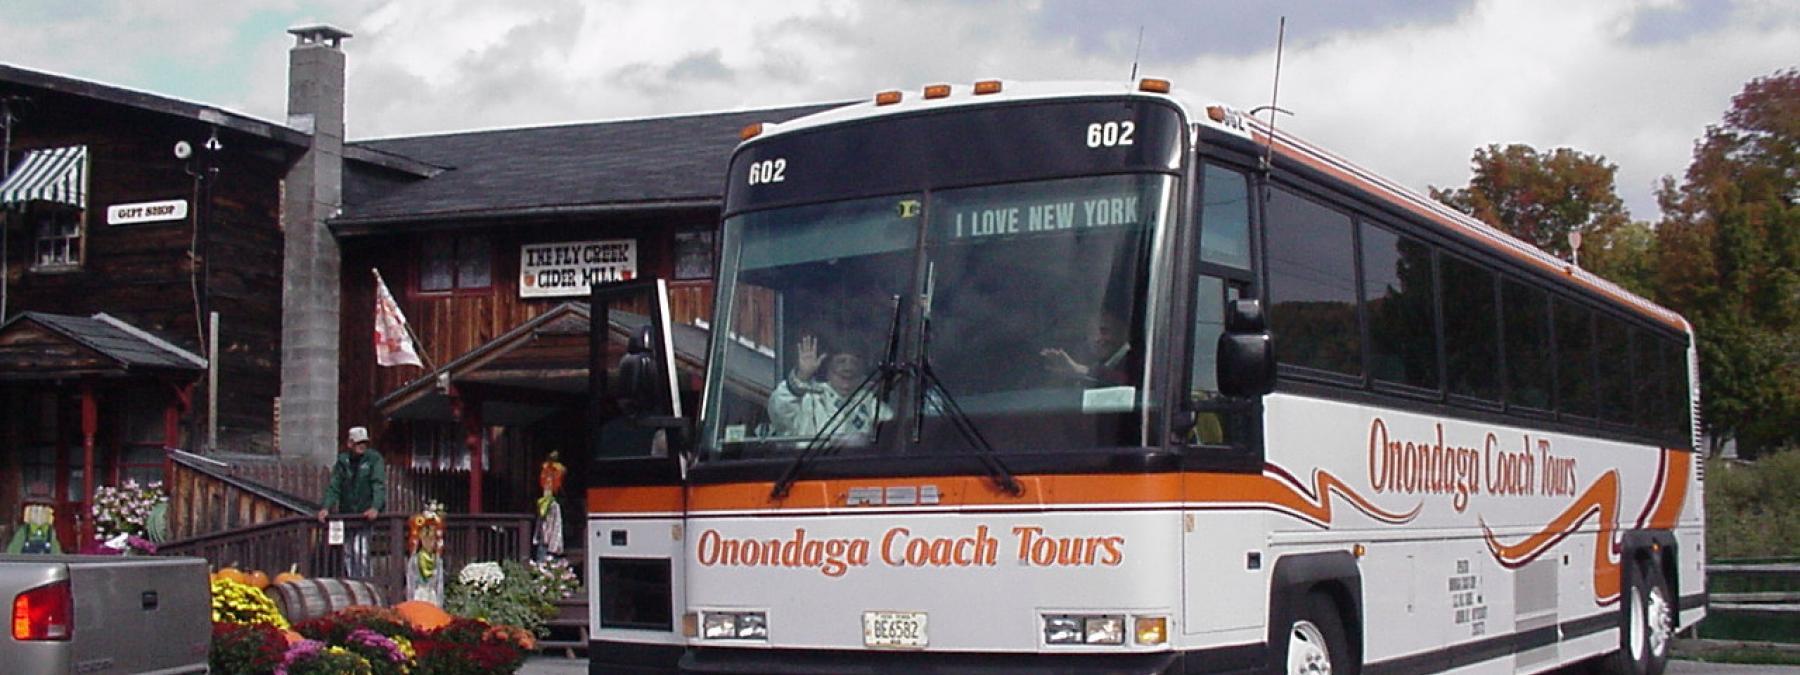 Mototcoach Group Tour Menu